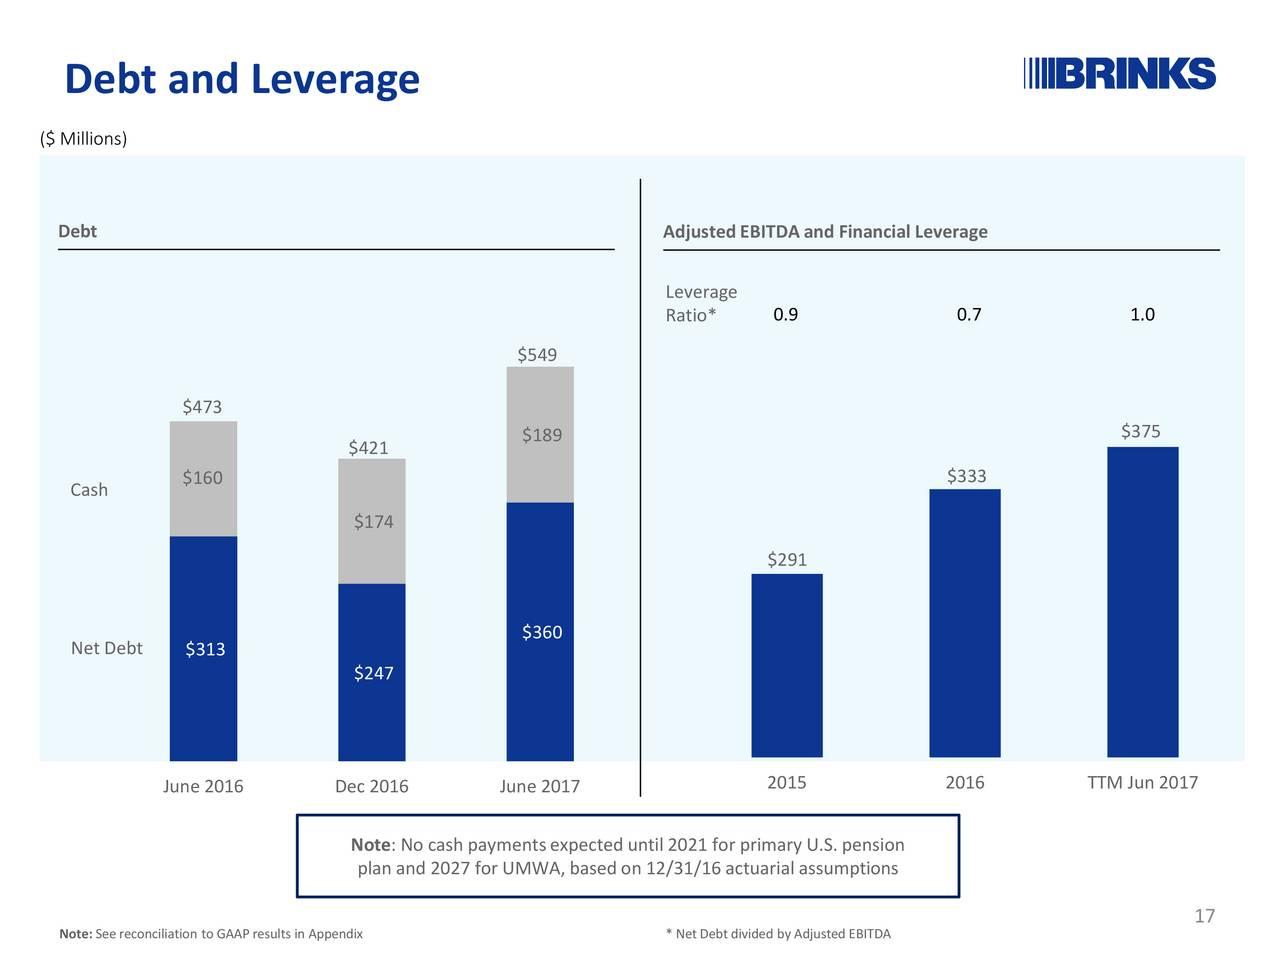 debt and leverage ratio